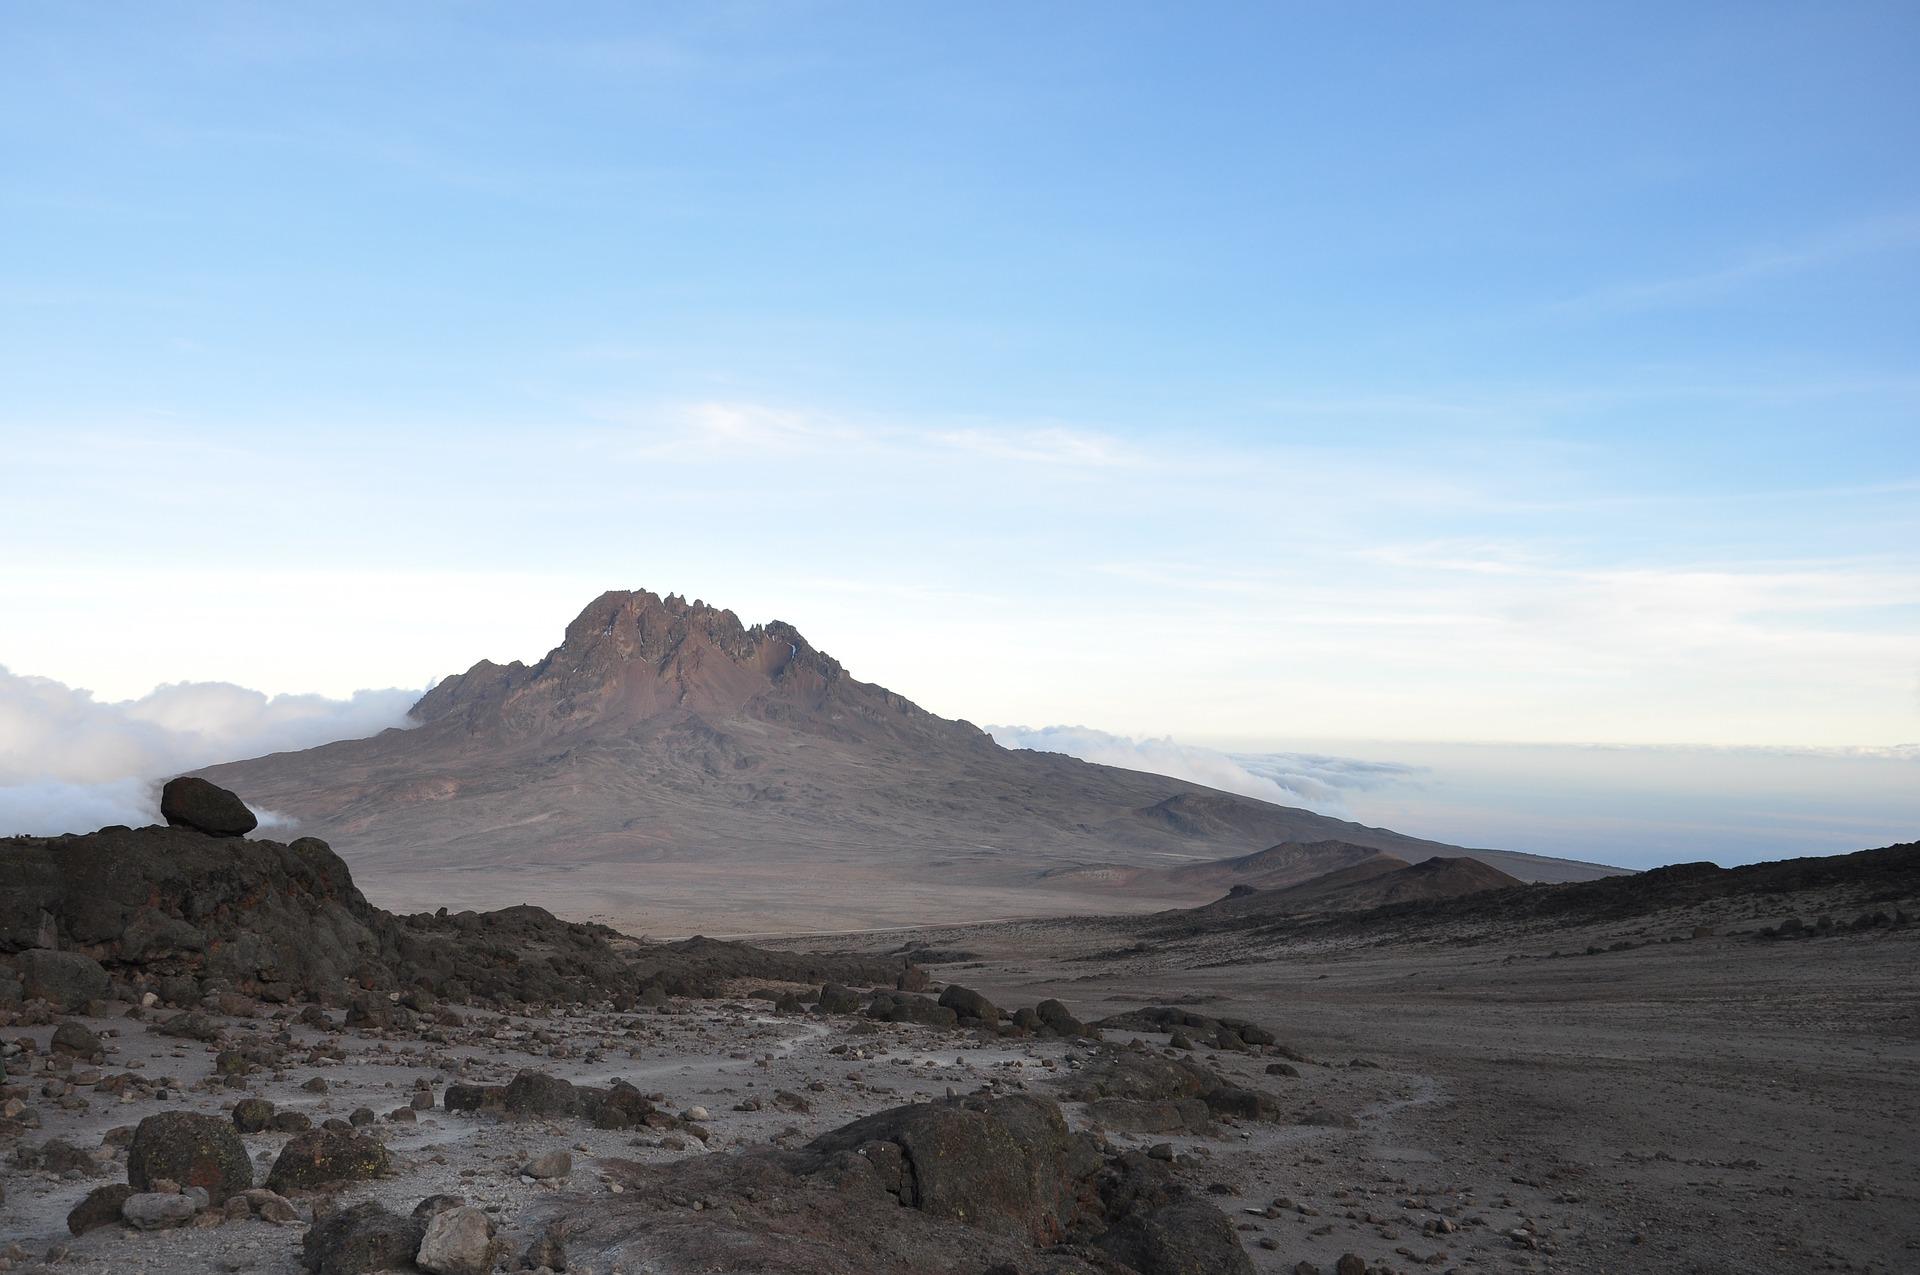 Peak mount Meru